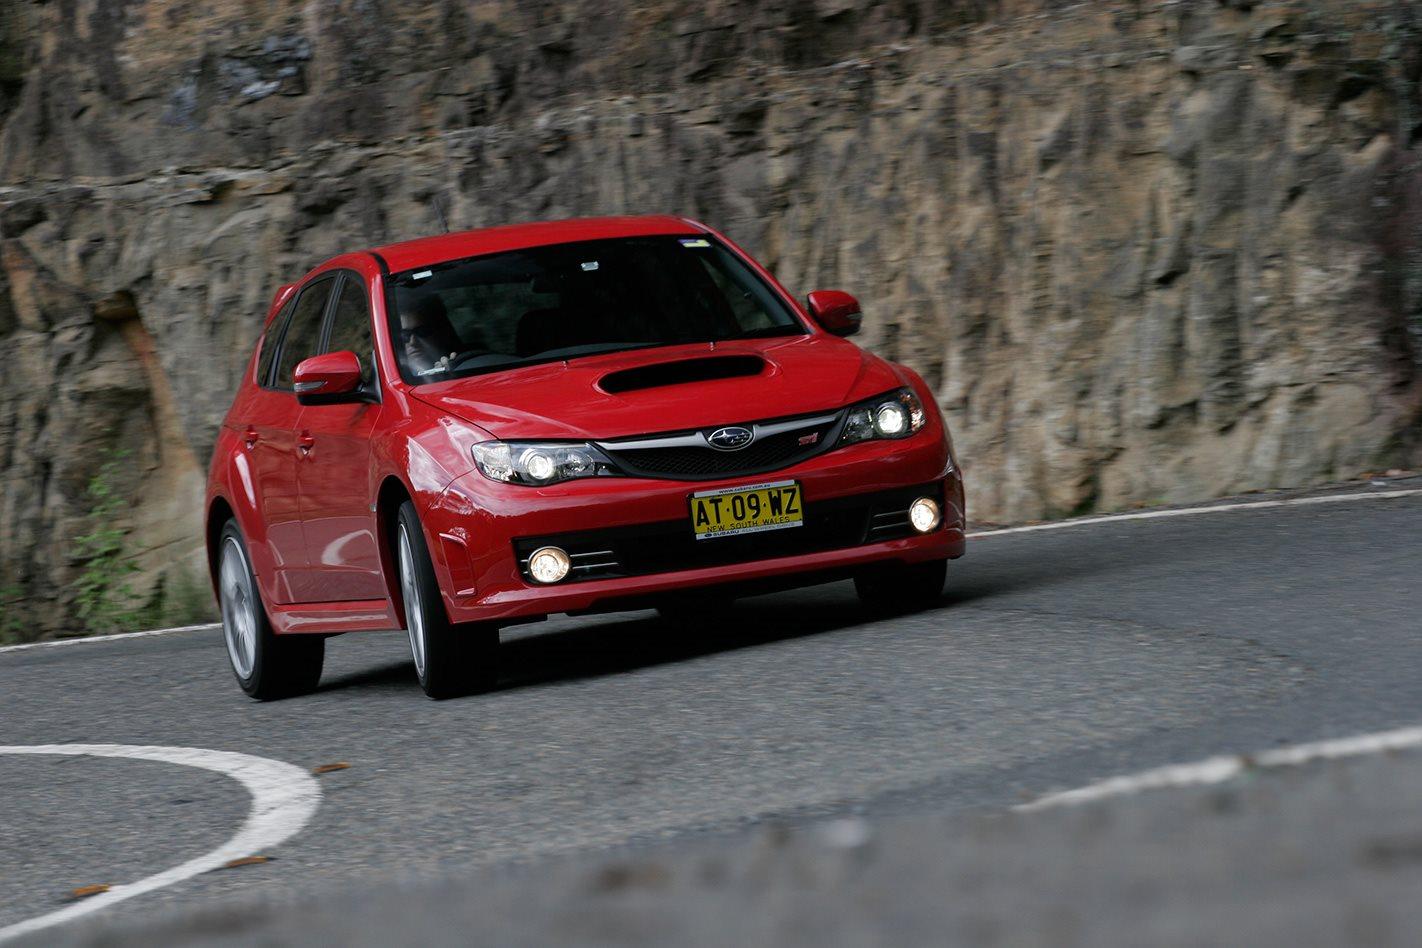 2008 Subaru Impreza WRX STI front.jpg